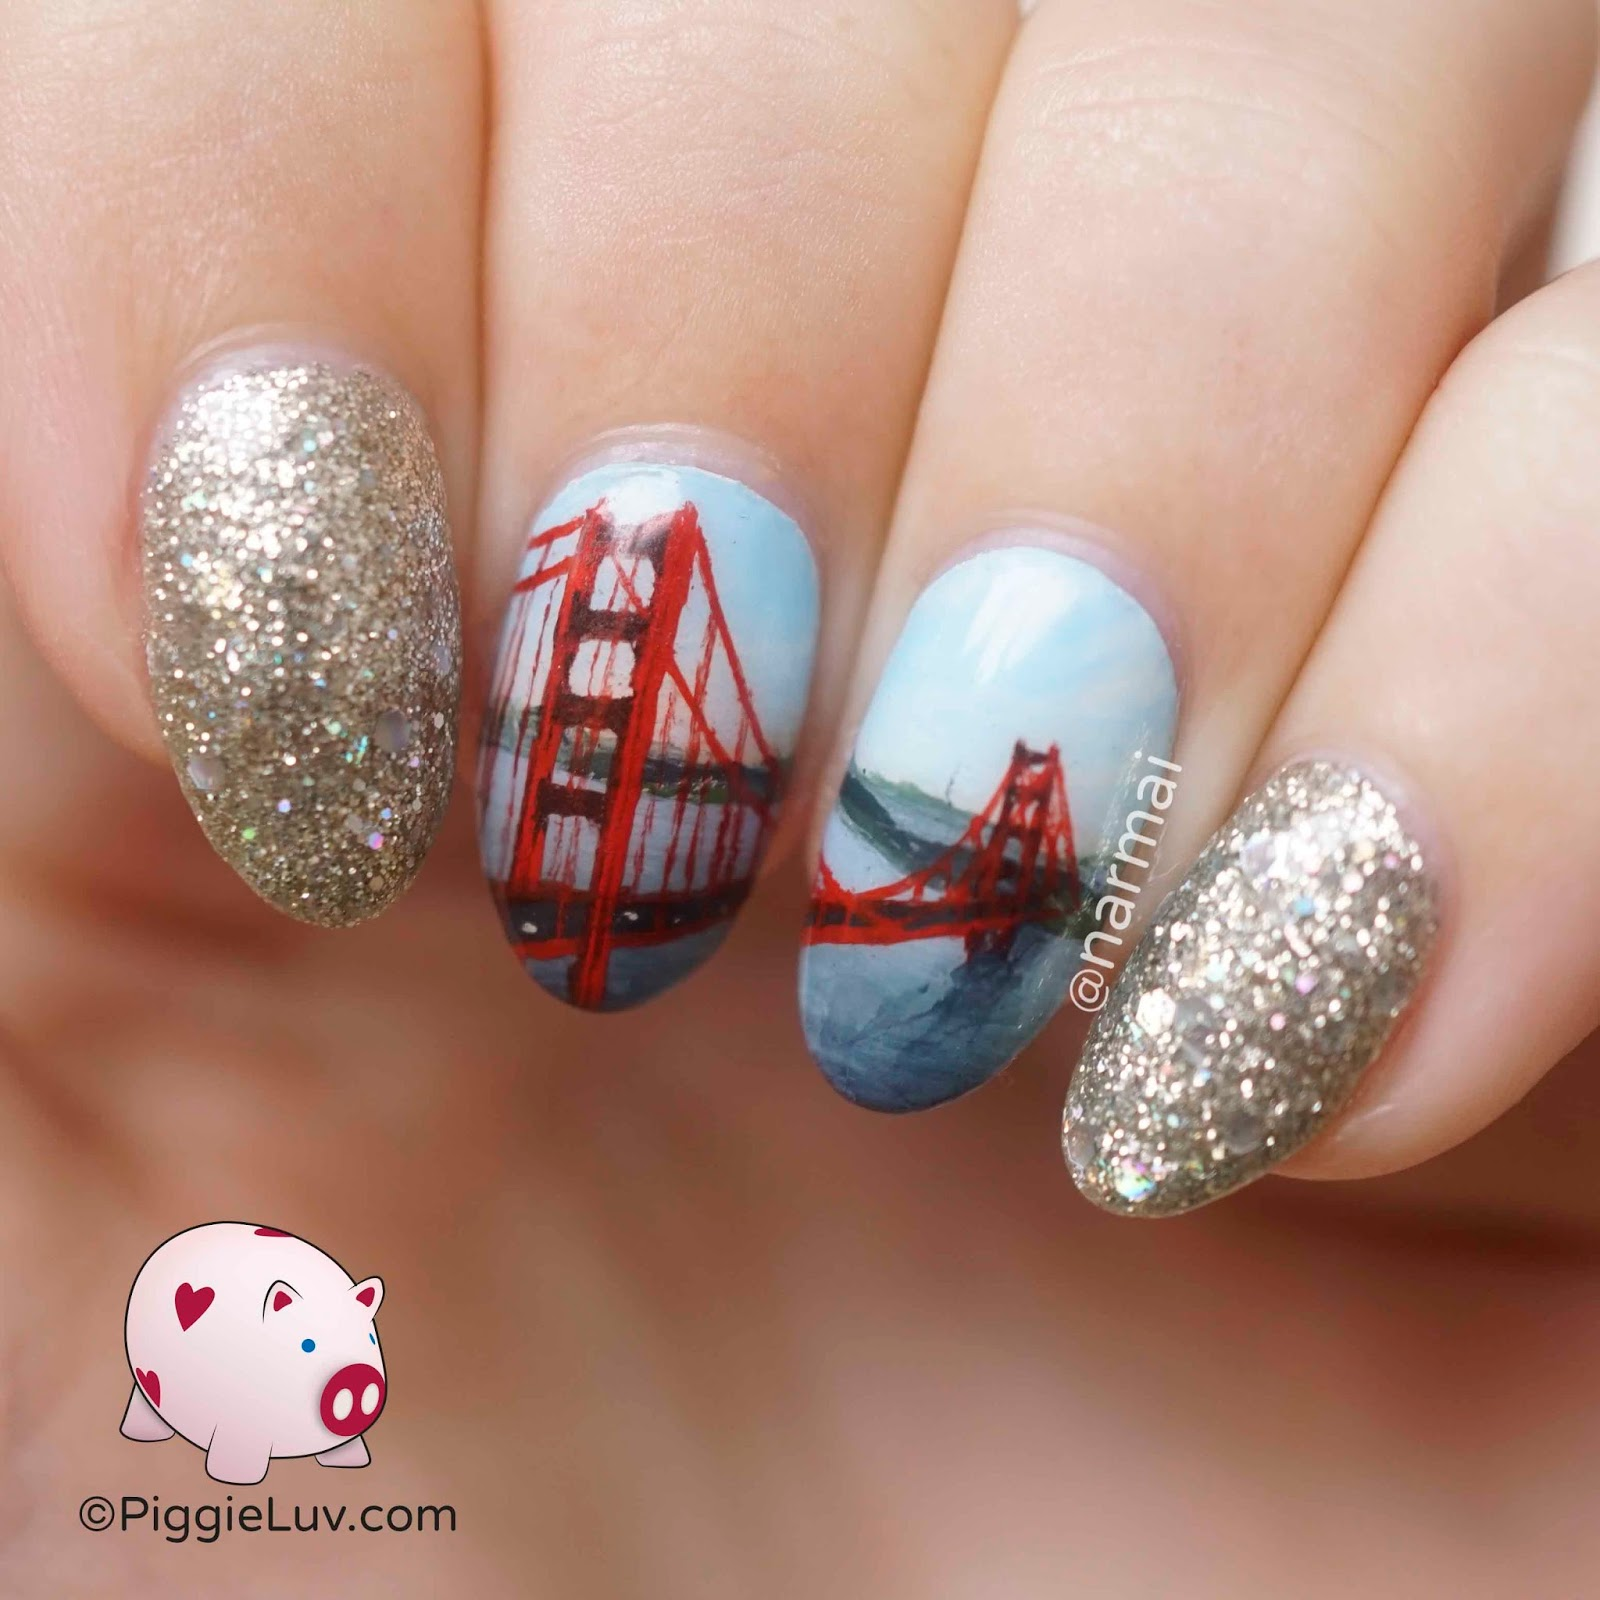 PiggieLuv: Golden Gate Bridge nail art